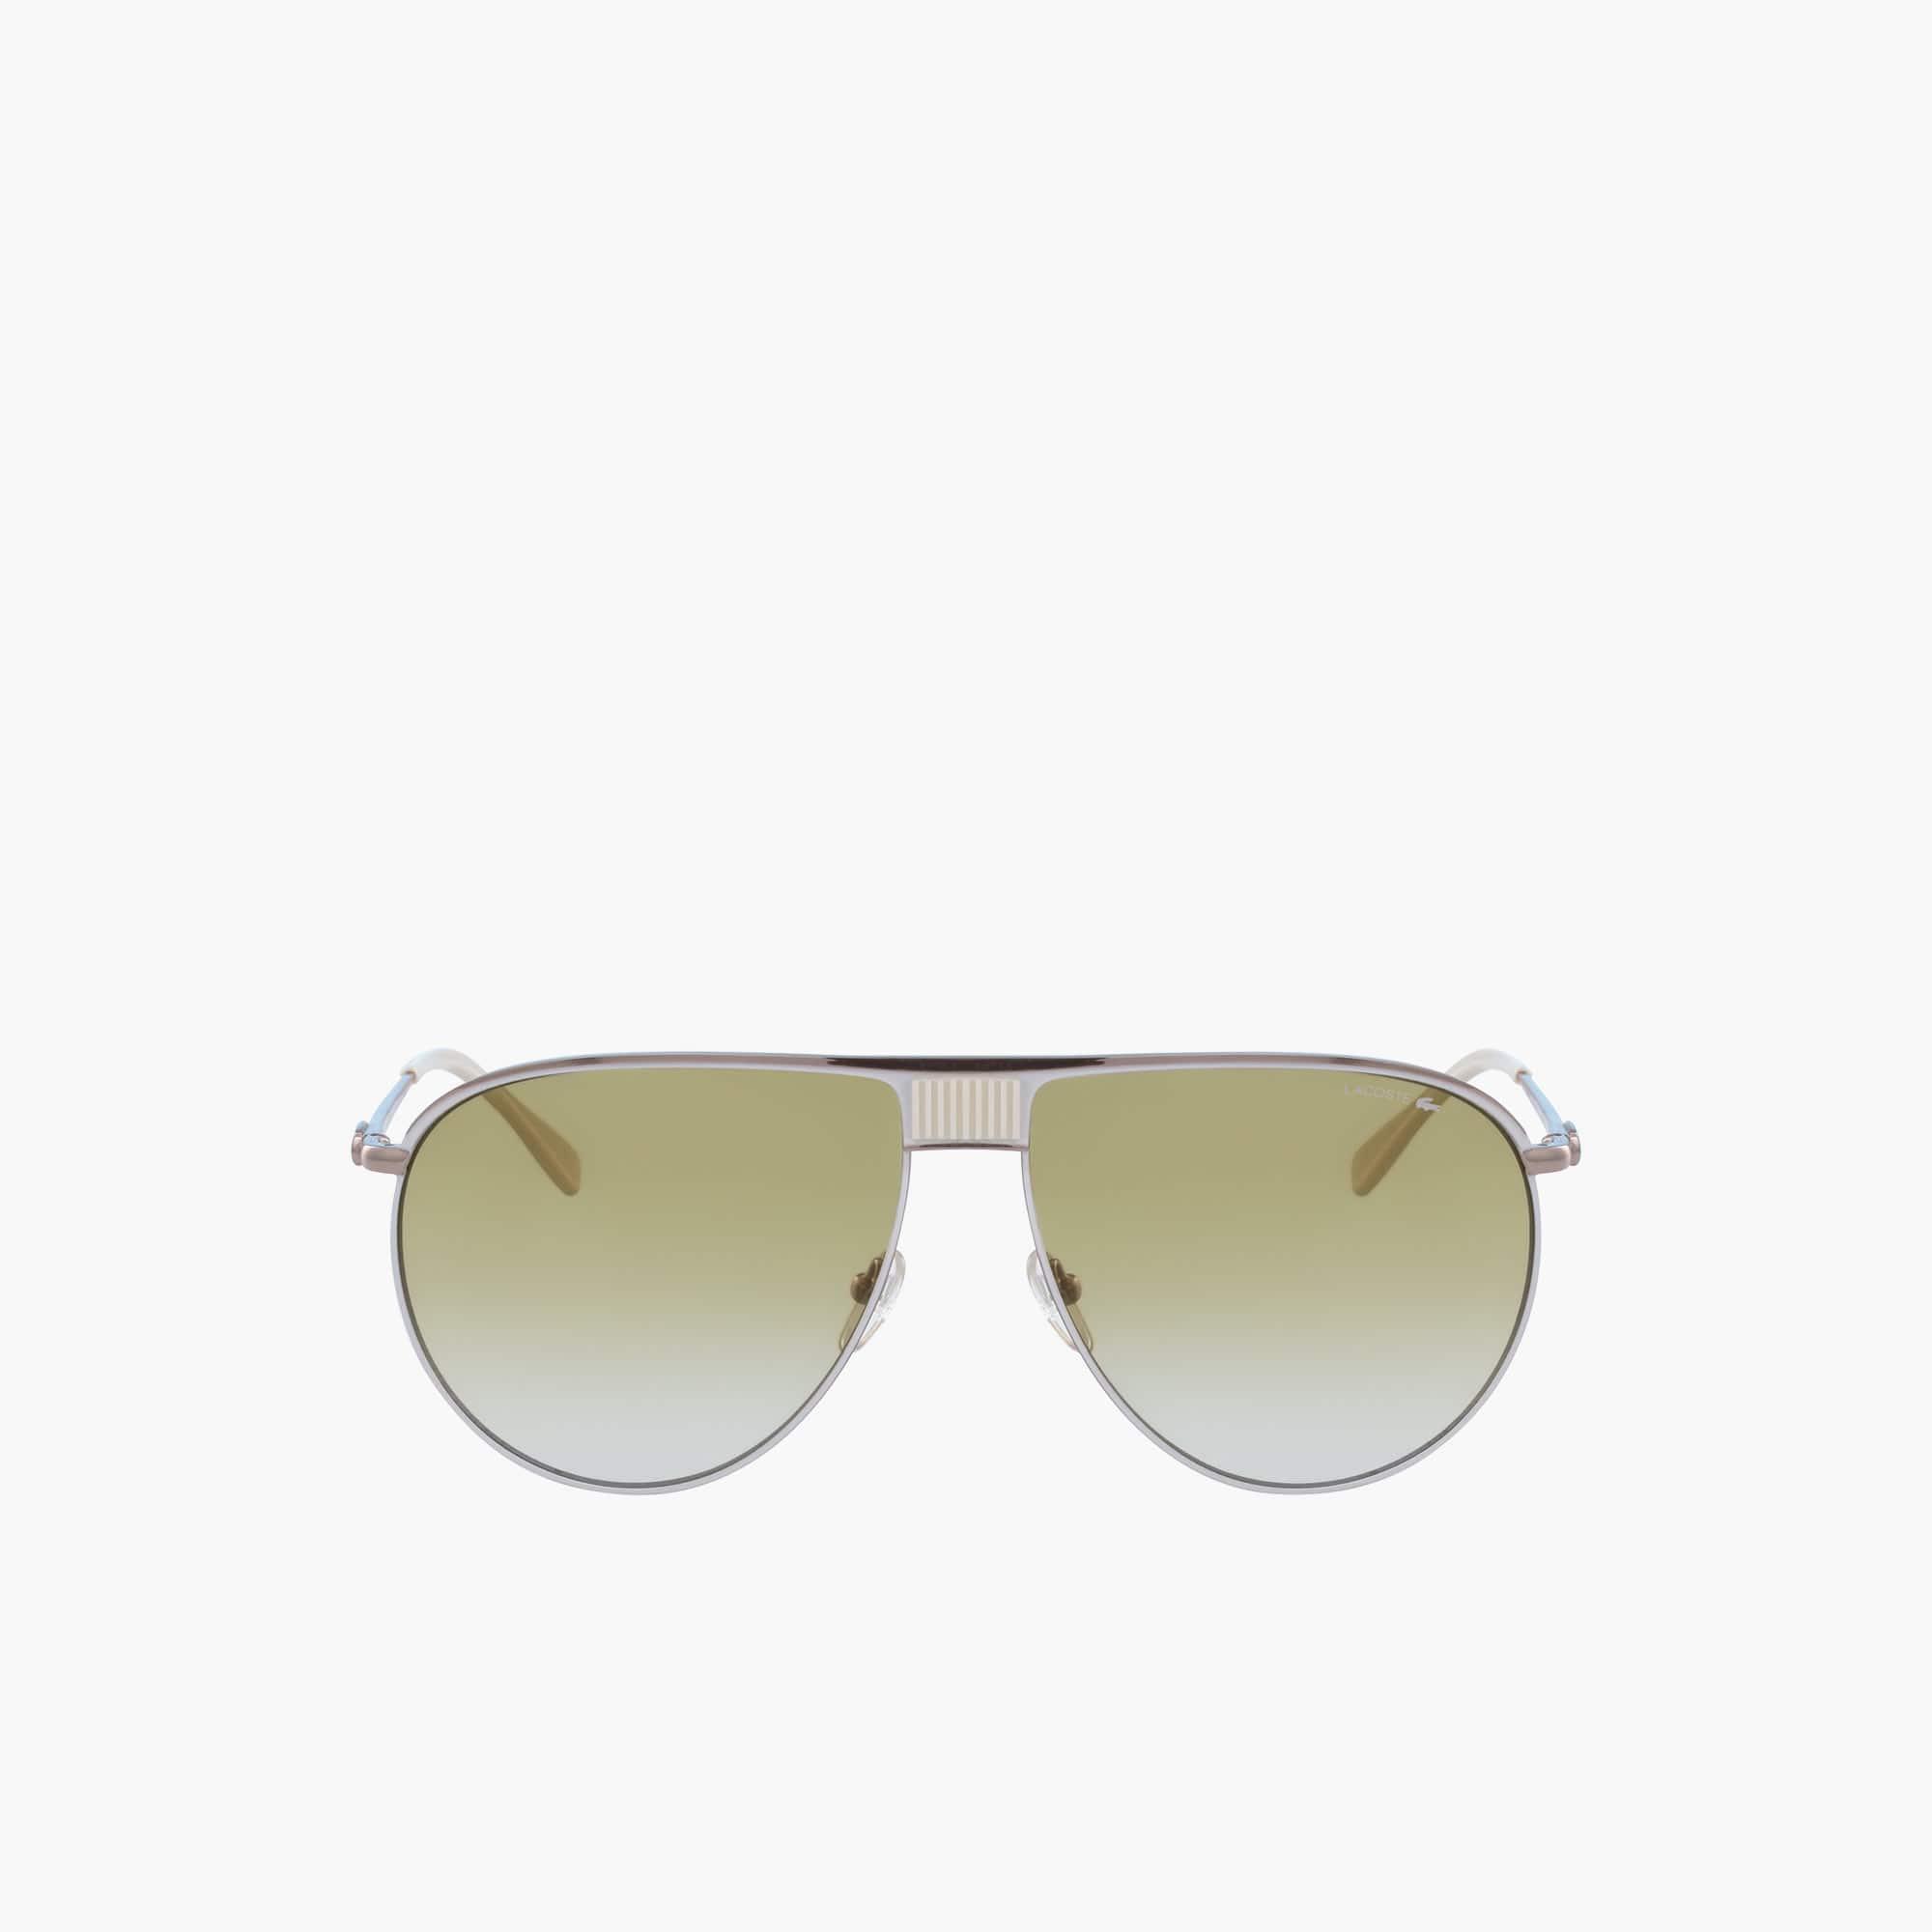 Unisex Fashion Show-zonnebril met metalen montuur